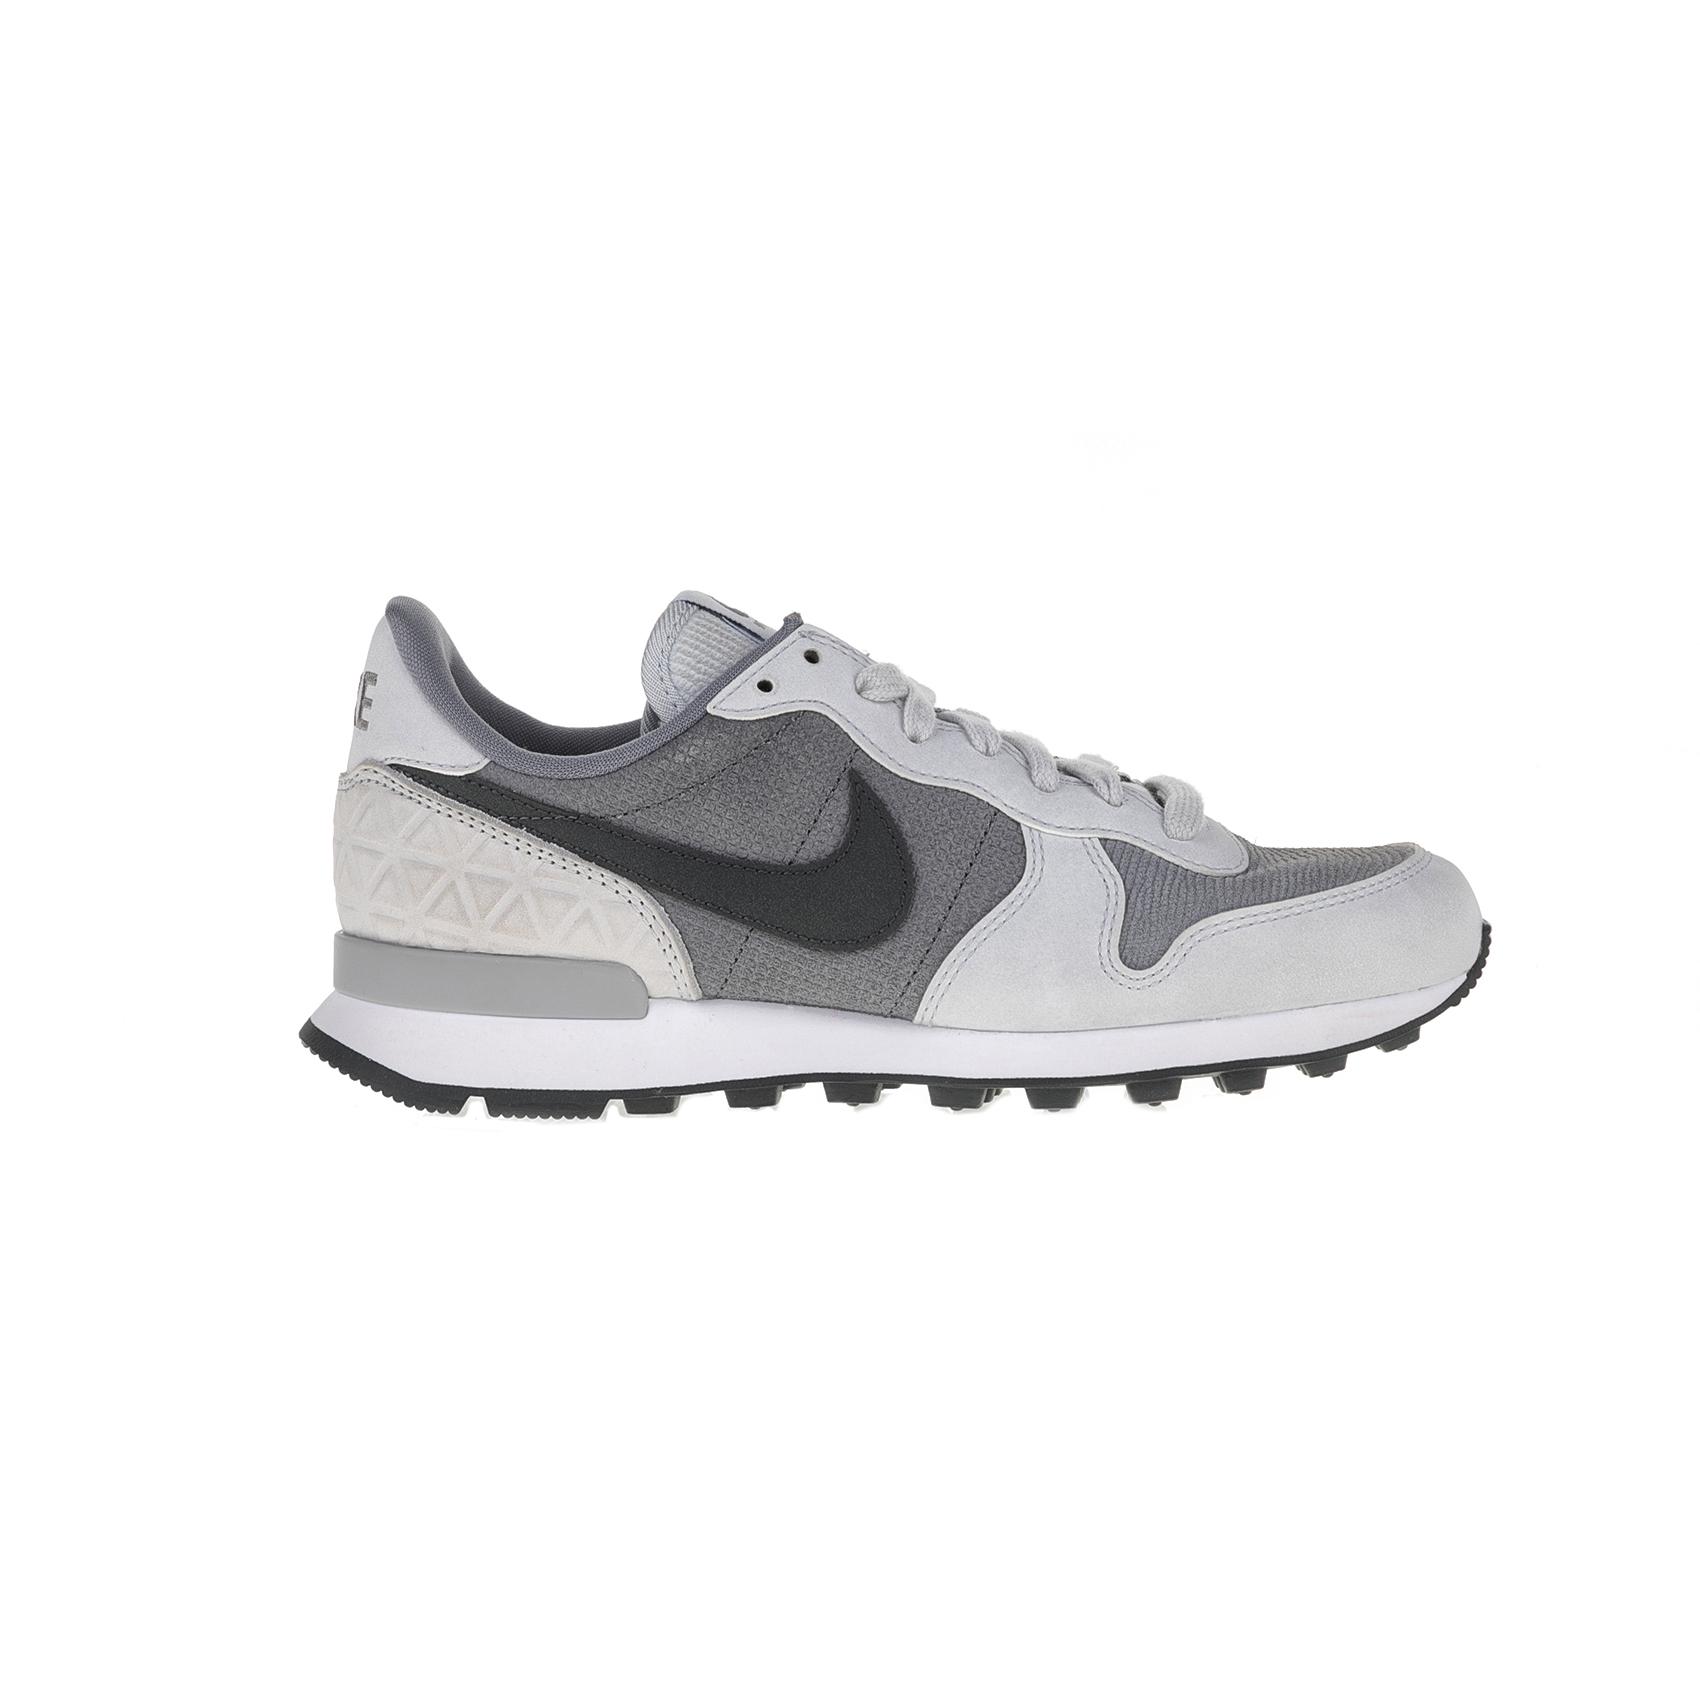 NIKE – Γυναικεία αθλητικά παπούτσια Nike INTERNATIONALIST PRM εκρού